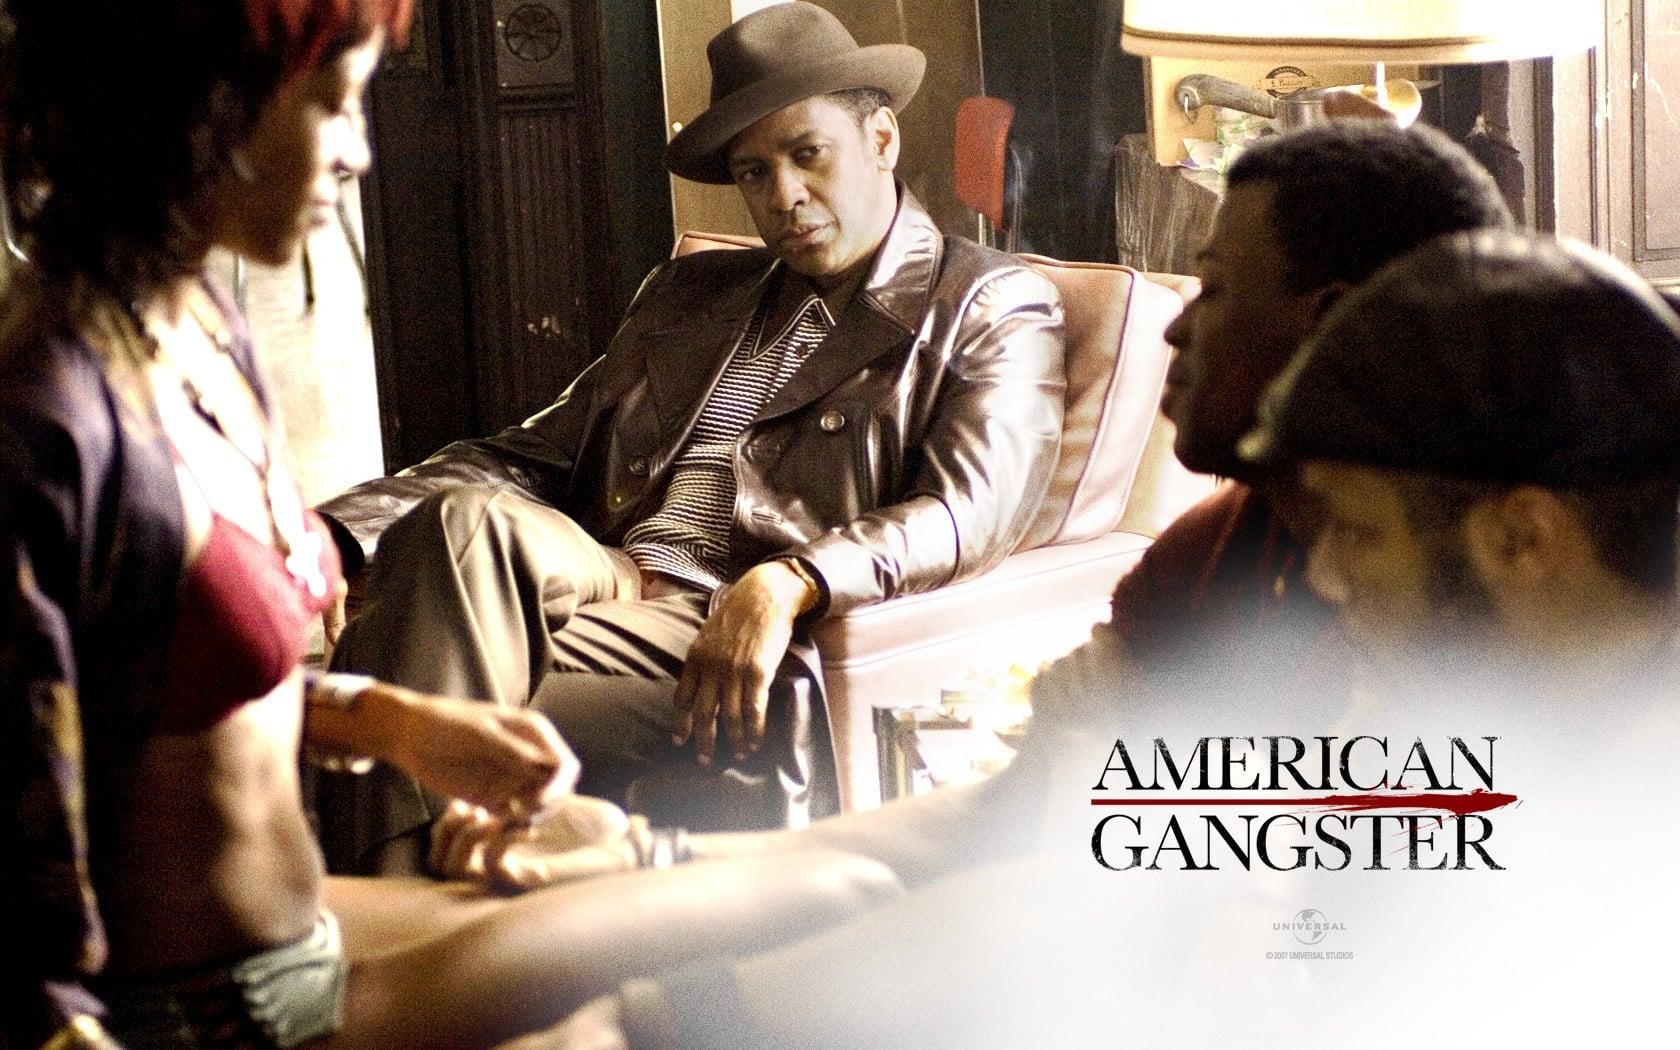 Amrican Gangster